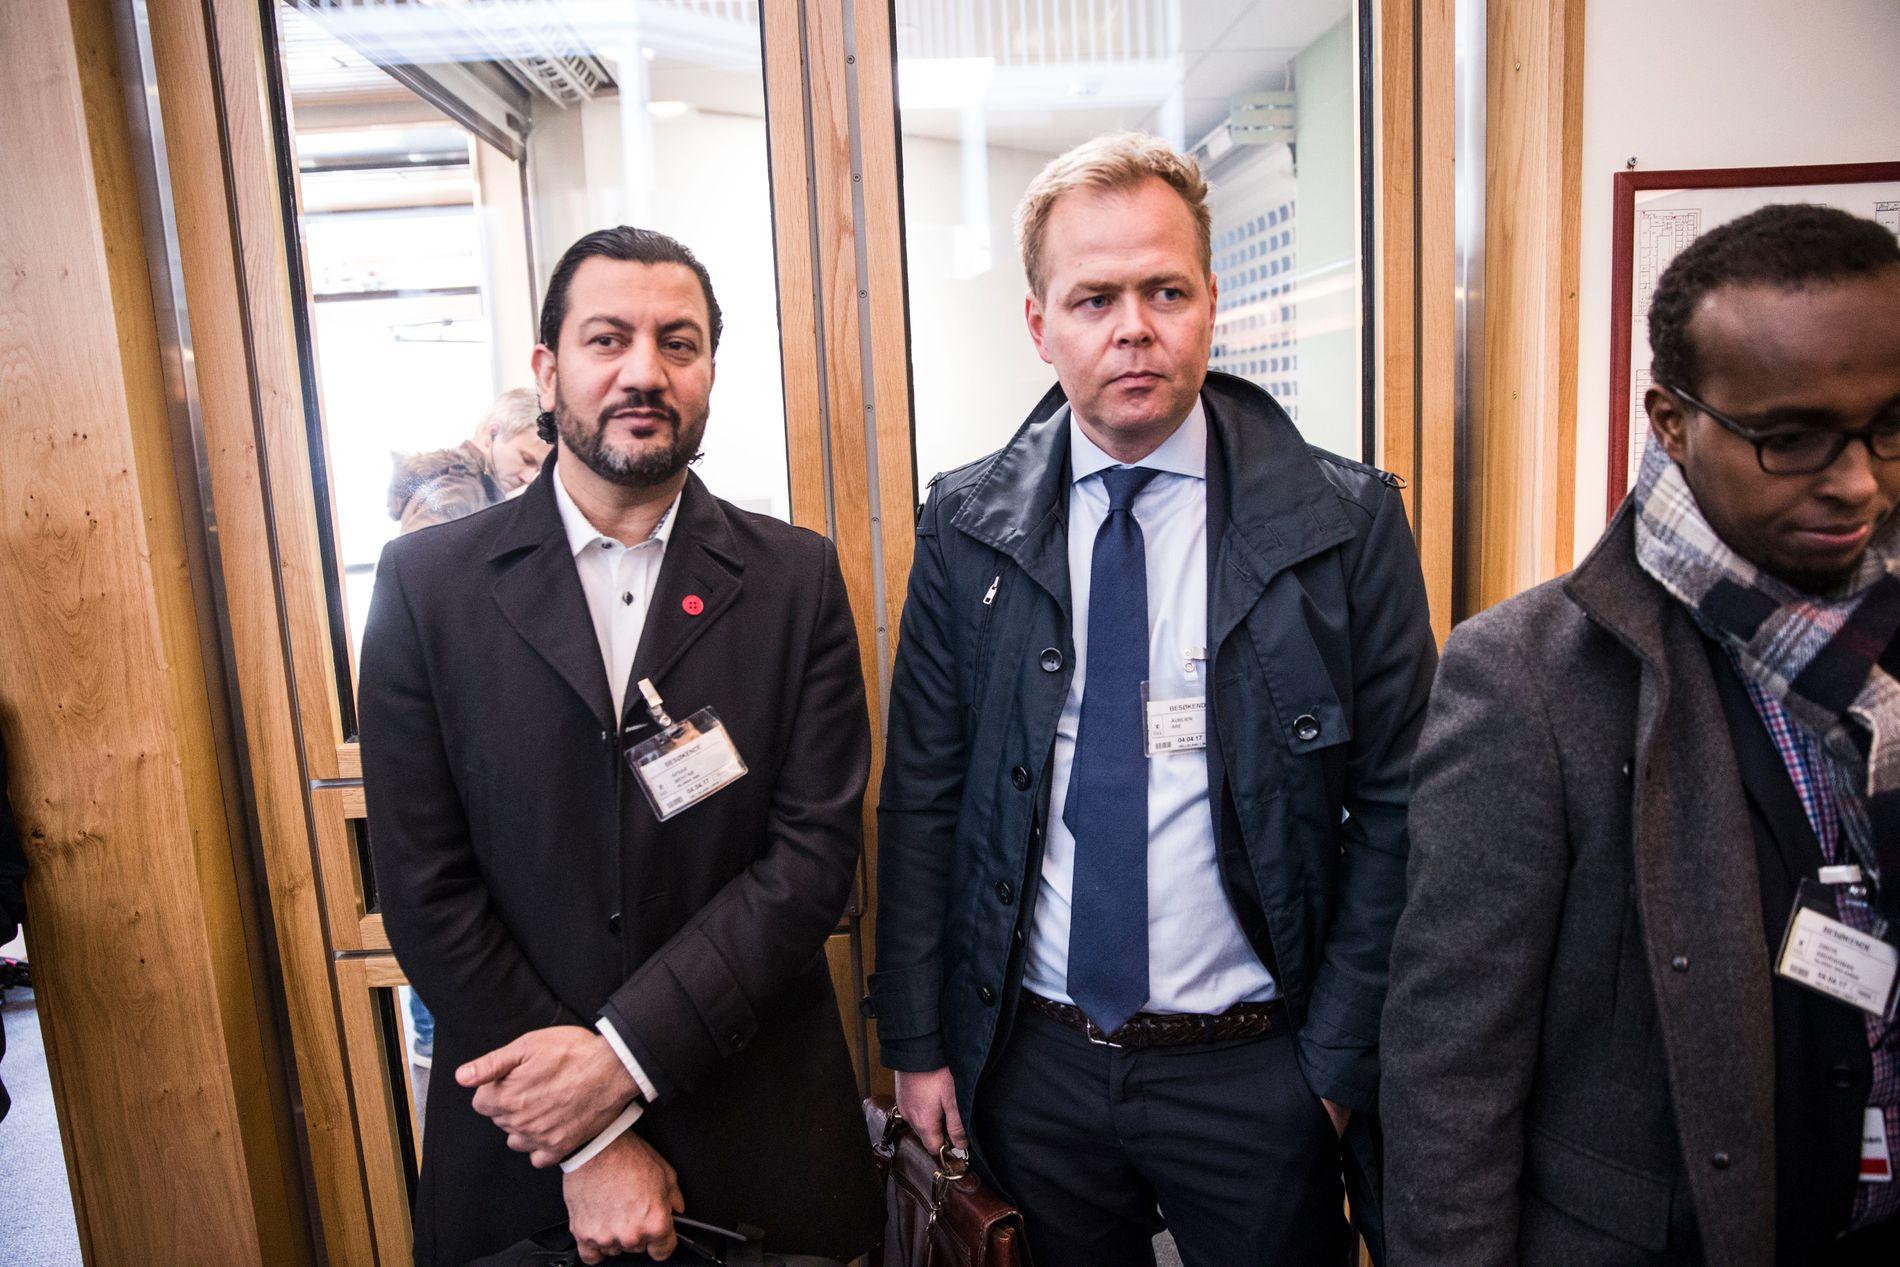 FÅR IKKE STØTTE NÅ: Generalsekretær Mehtab Afsar i Islamsk Råd Norge får ikke utbetalingen fra Kulturdepartementet som skulle komme i juli.